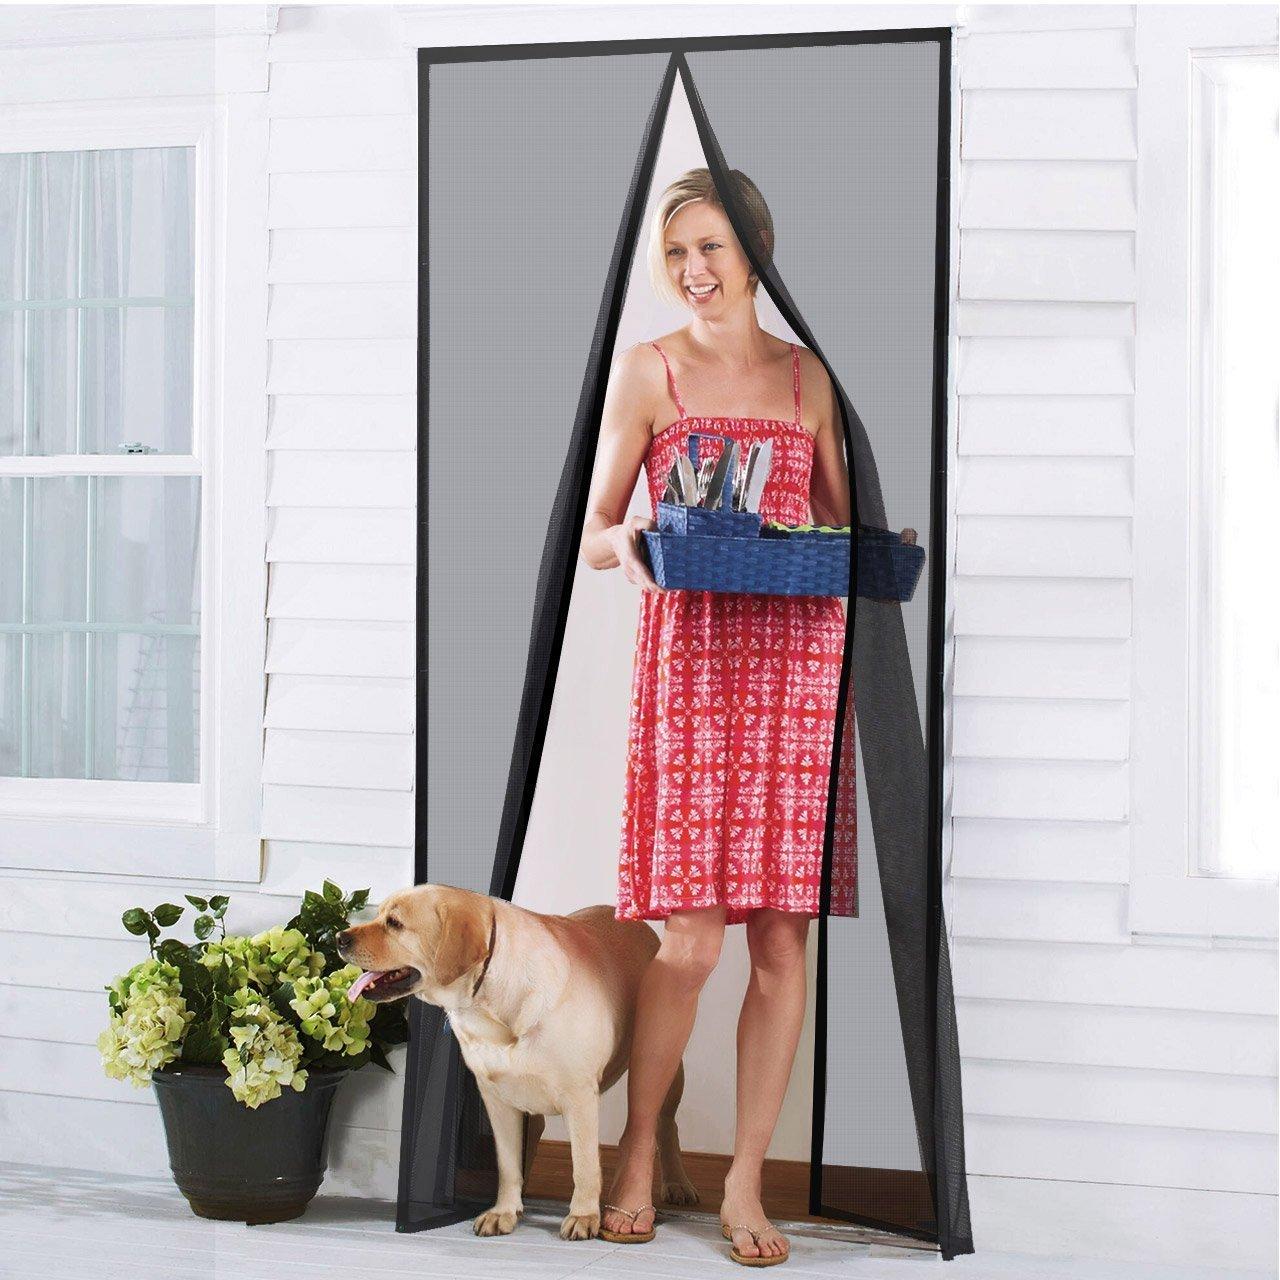 Usa Star Magnetic Screen Door Heavy Duty Reinforced Mesh & FULL FRAME Fits Doors Up to 39''x82'' MegaMesh